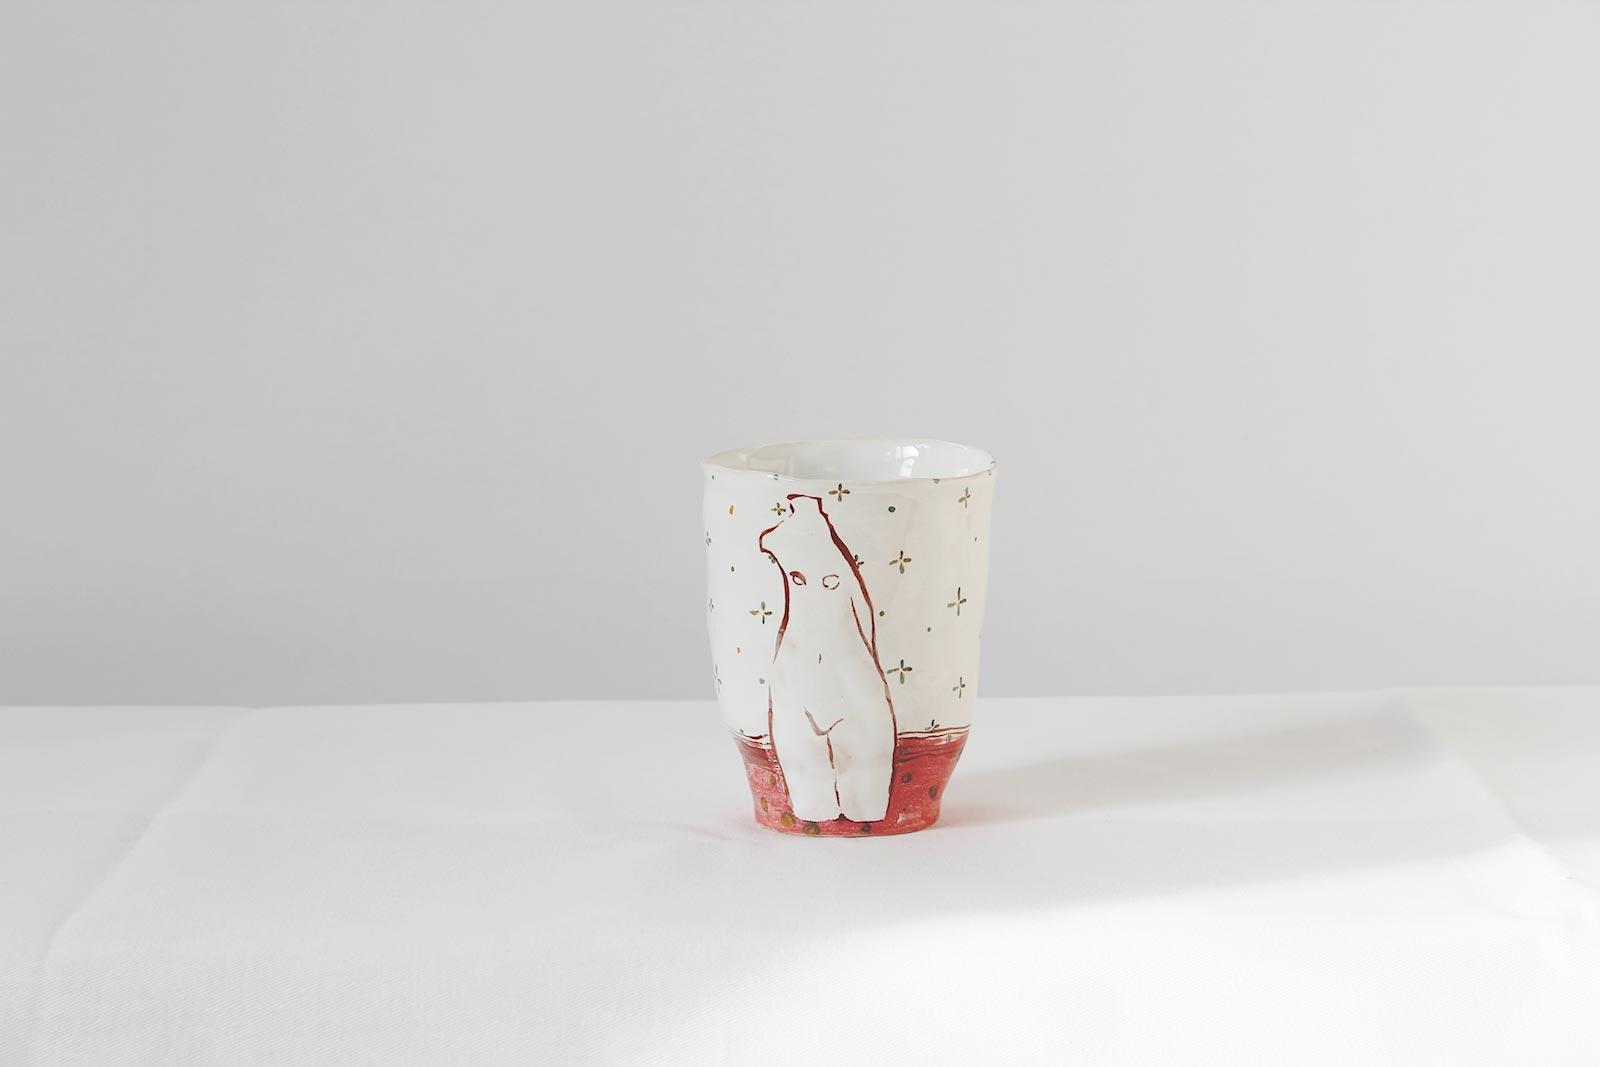 Glass from ceramics (Handmade)